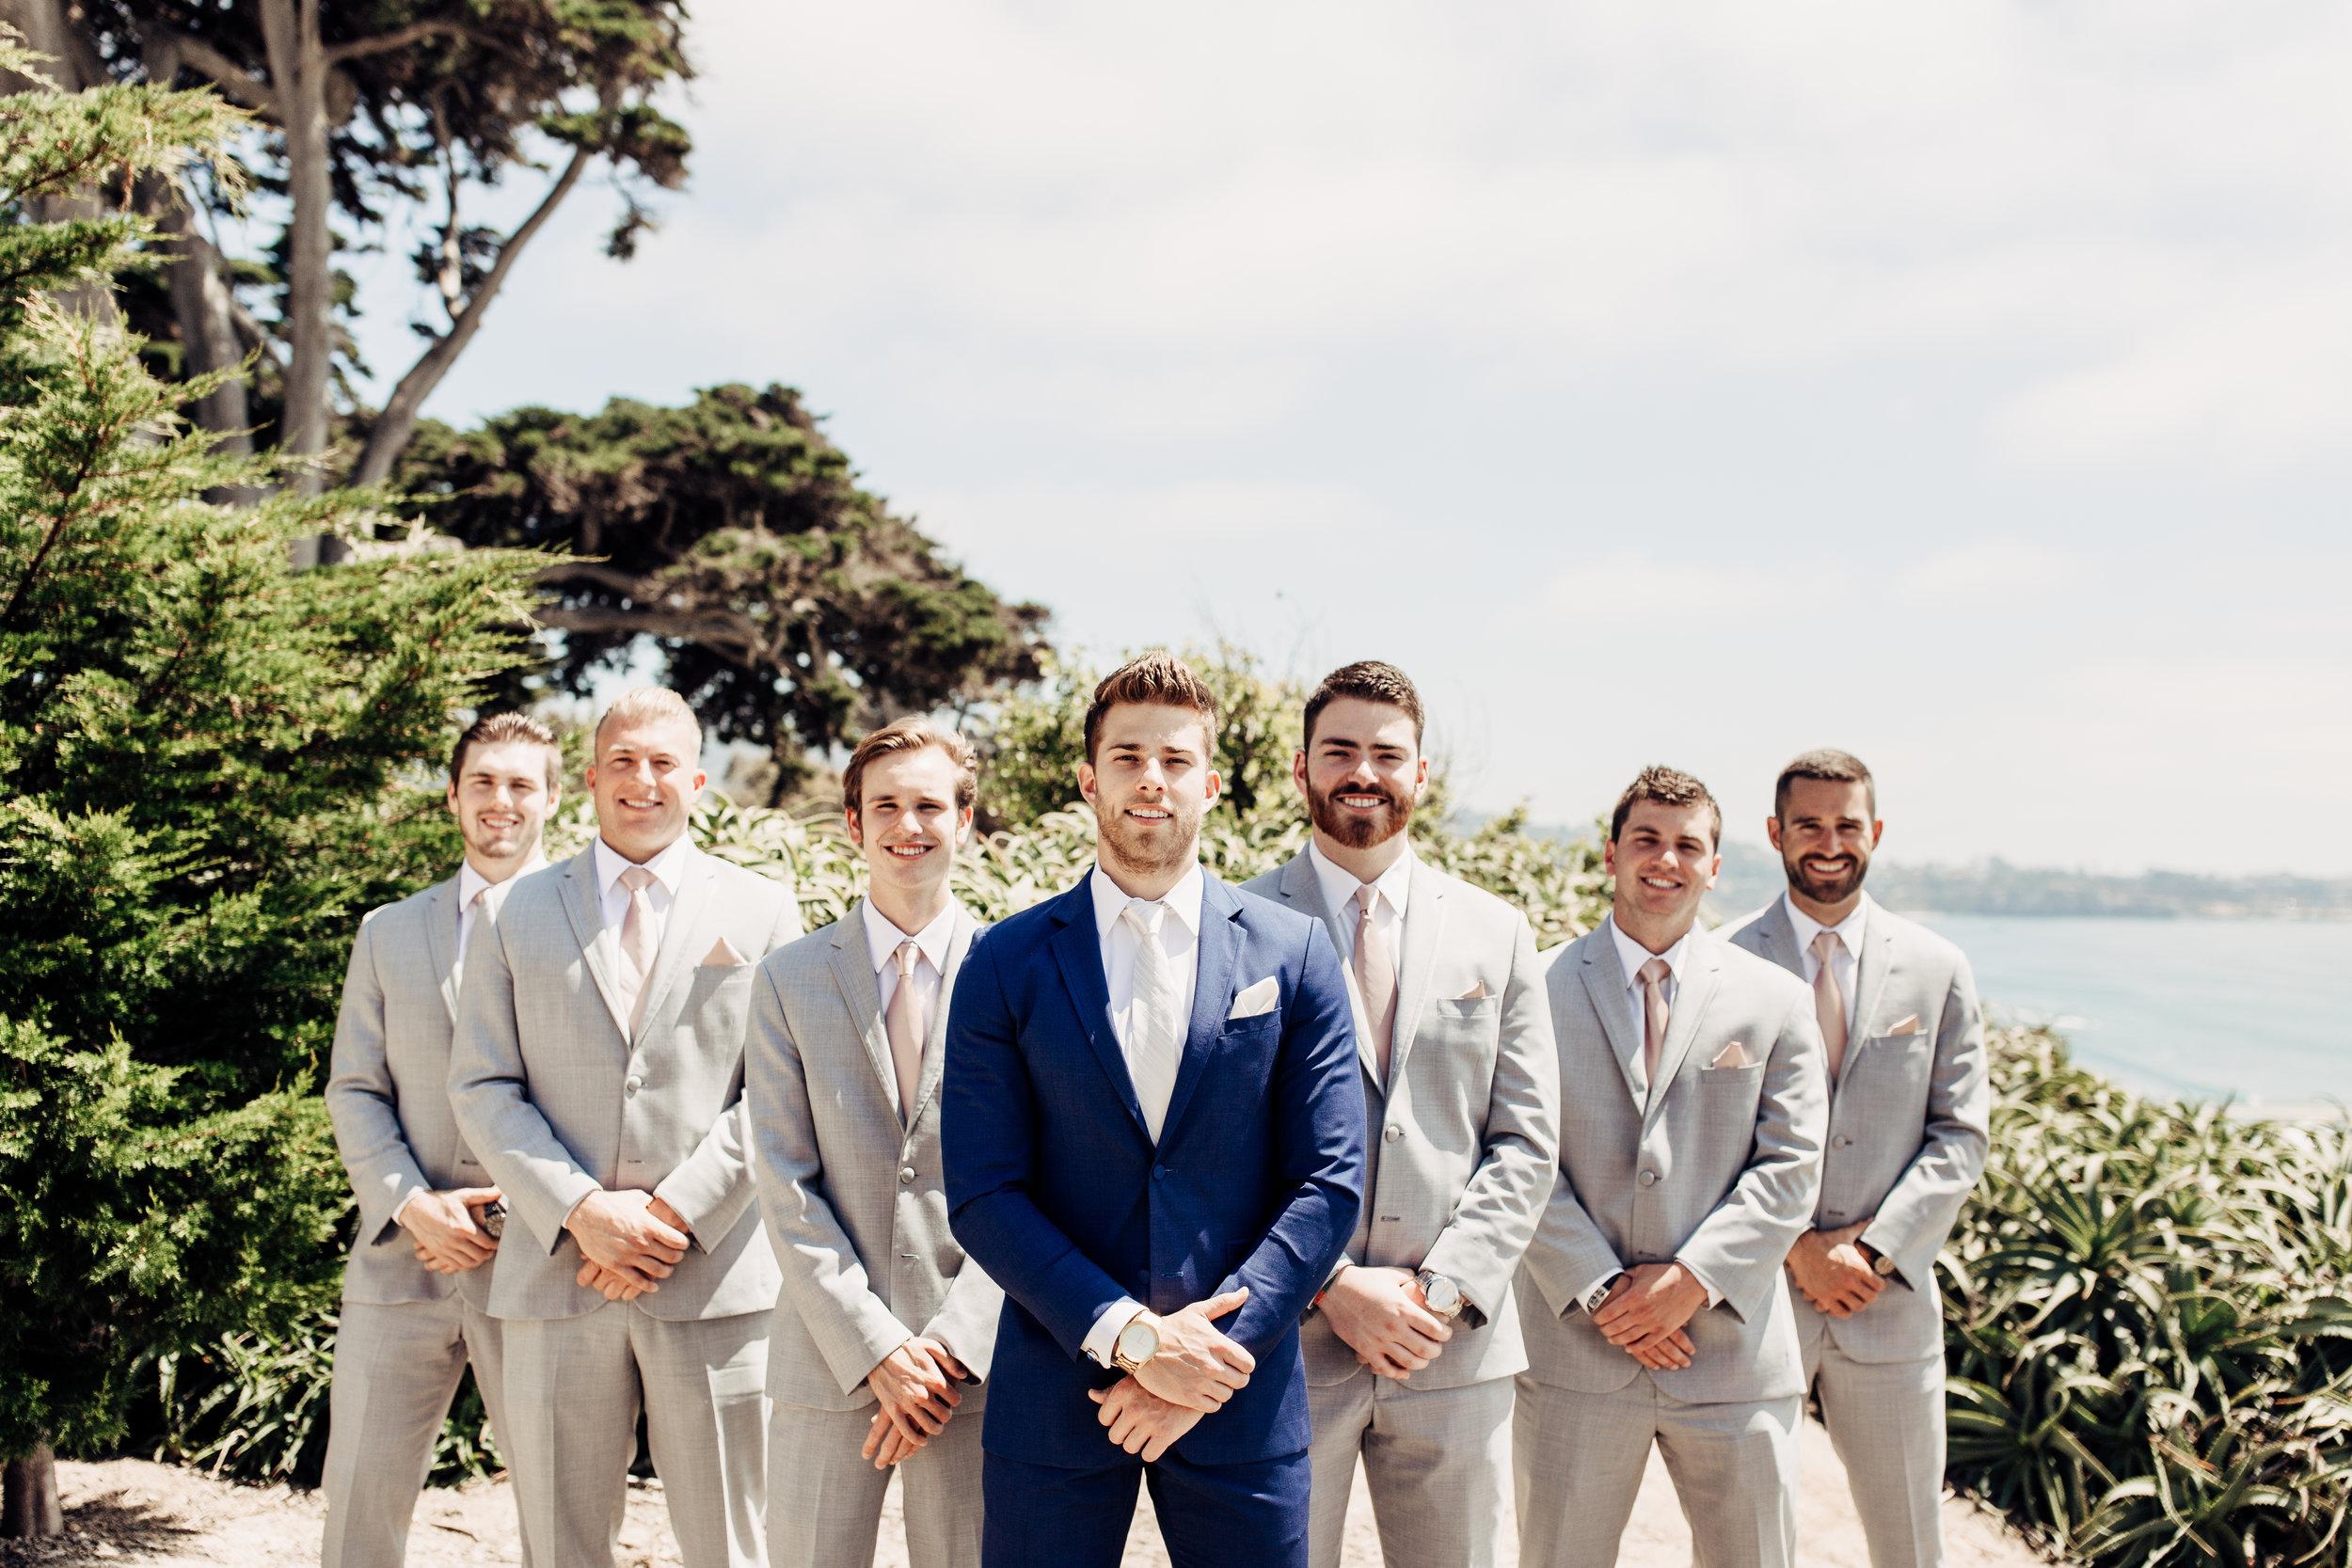 martin-johnson-house-wedding-san-diego4020.jpg